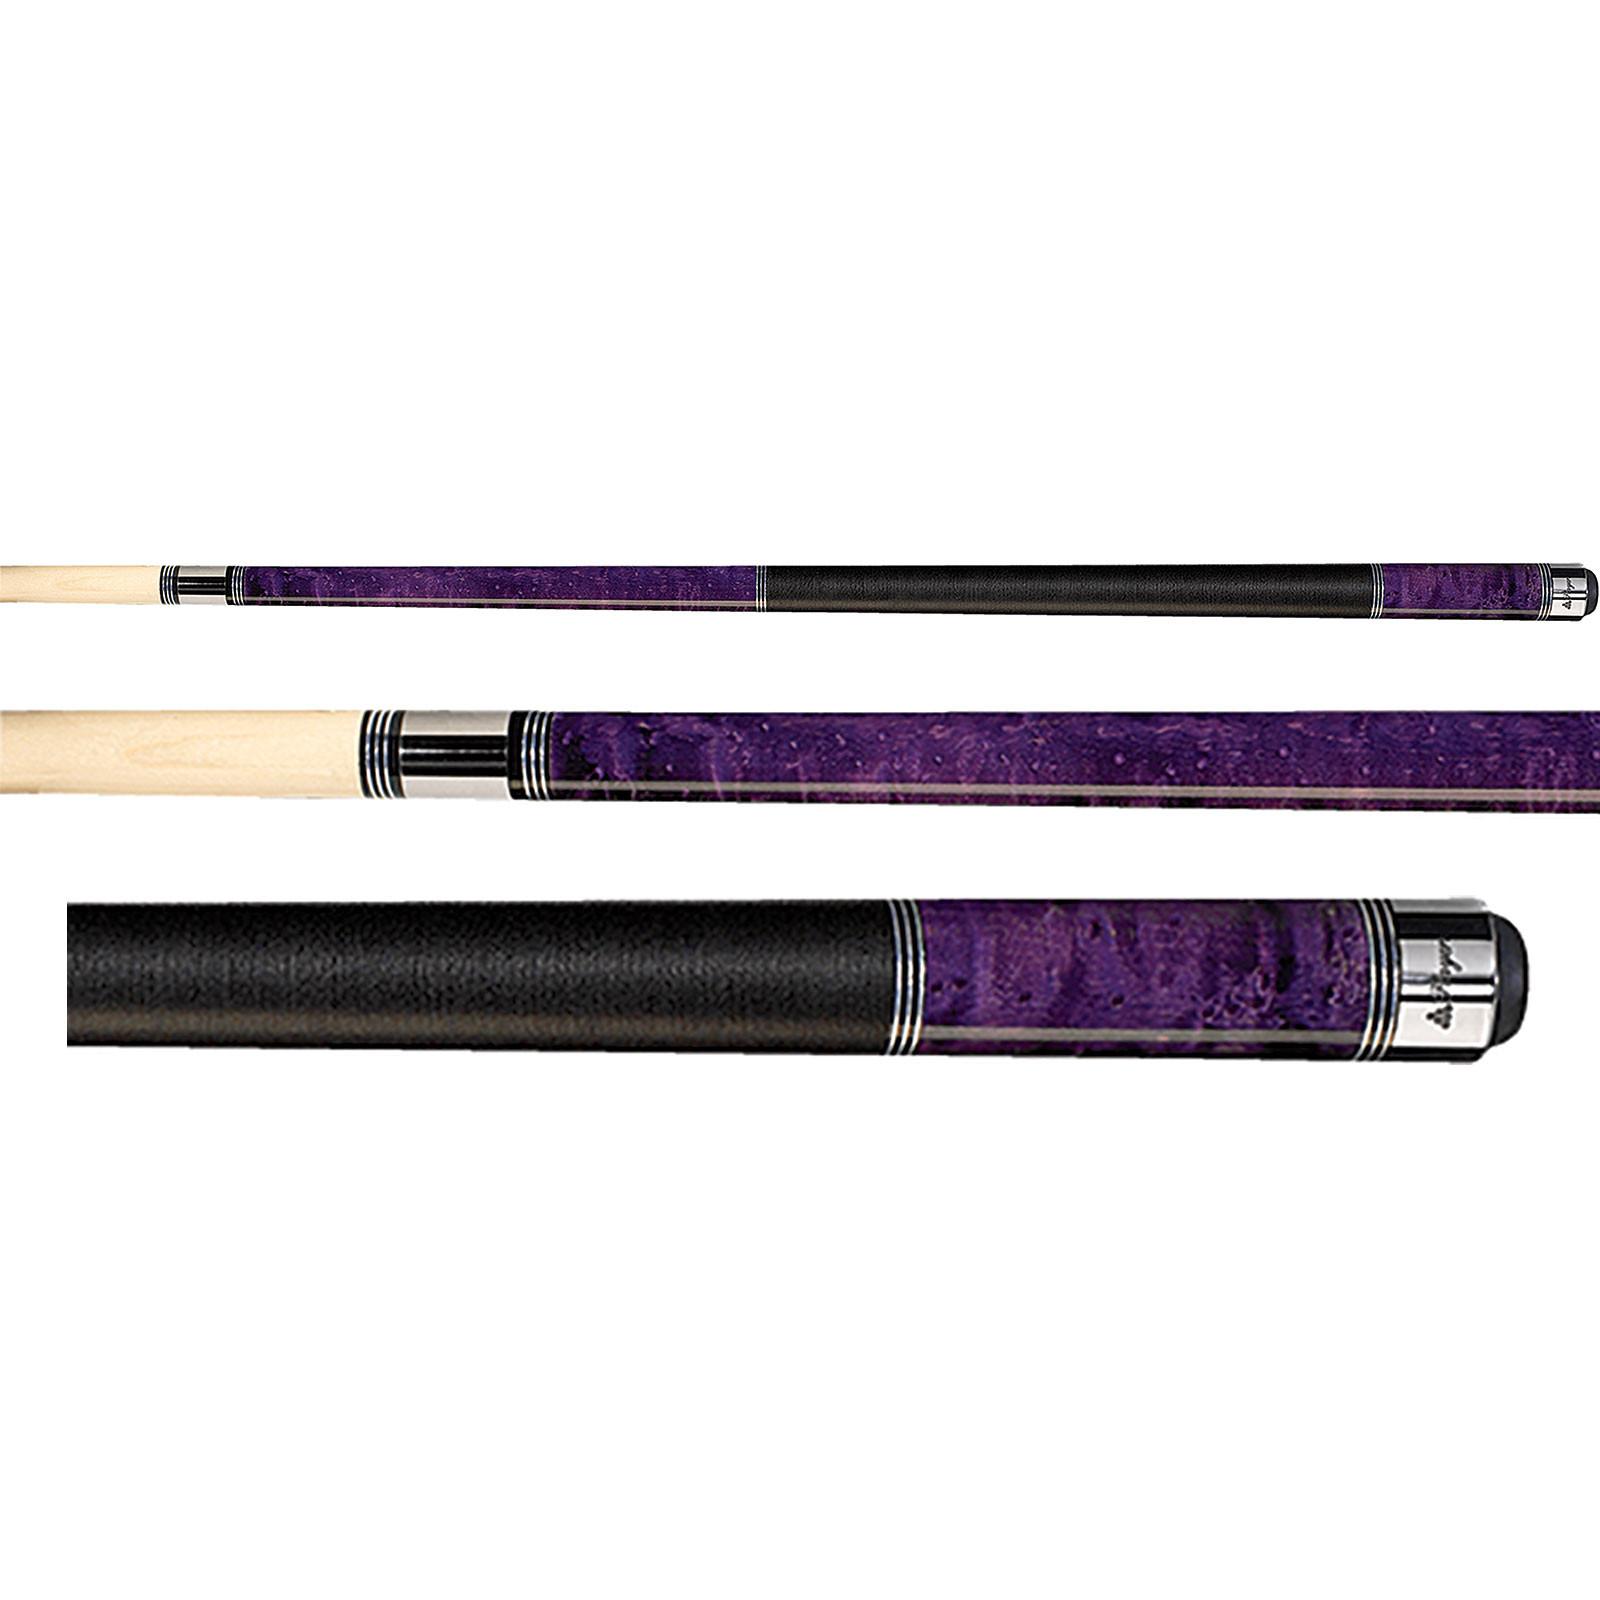 Players C-965 Royal Purple Pool Cue Stick